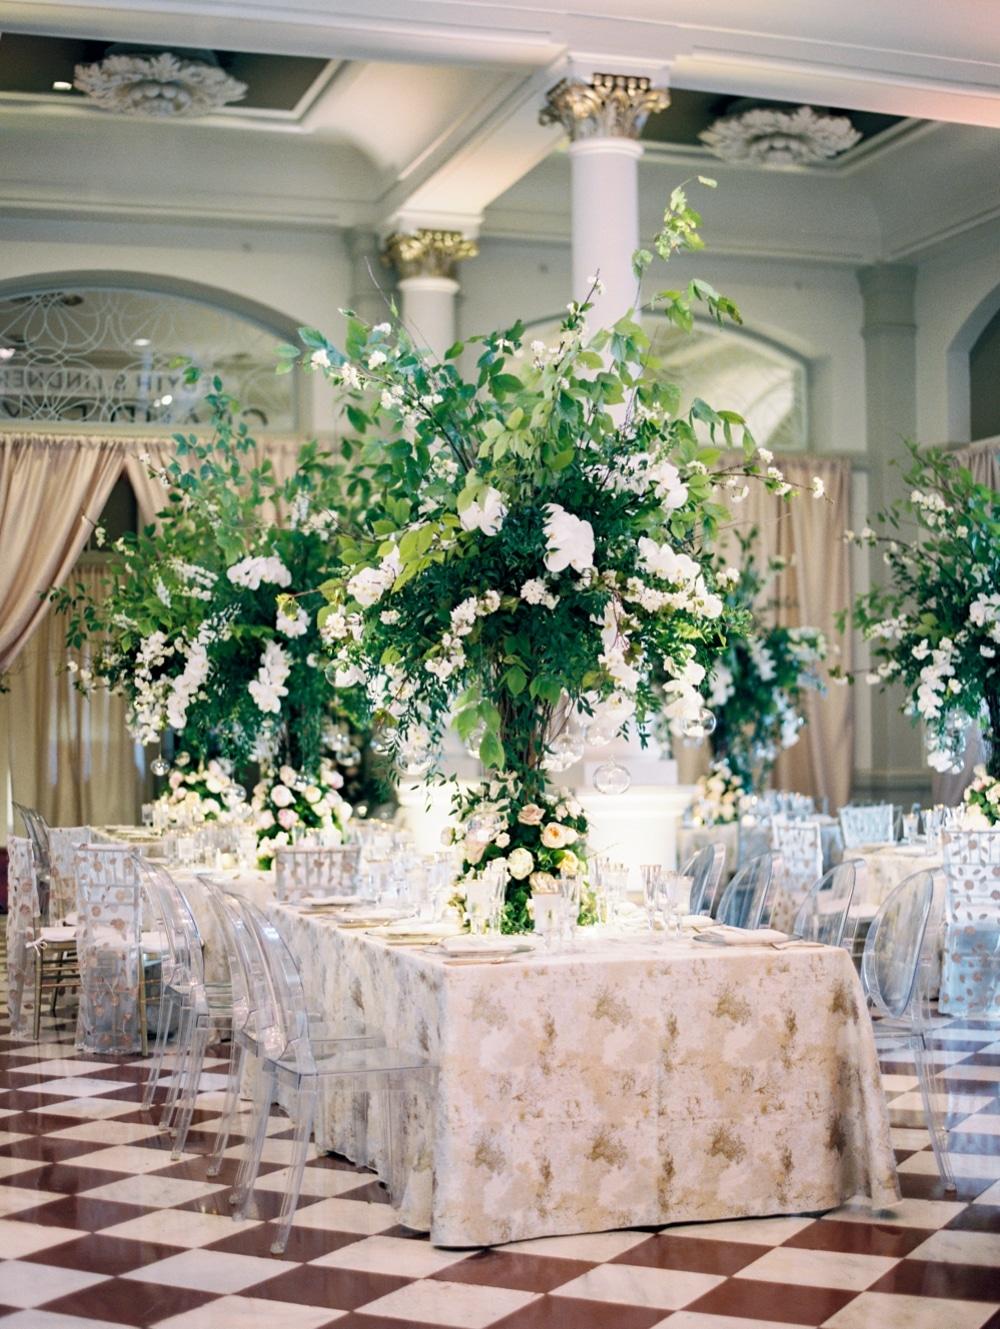 kristin-la-voie-photography-Cincinnati-Music-Hall-Wedding-239